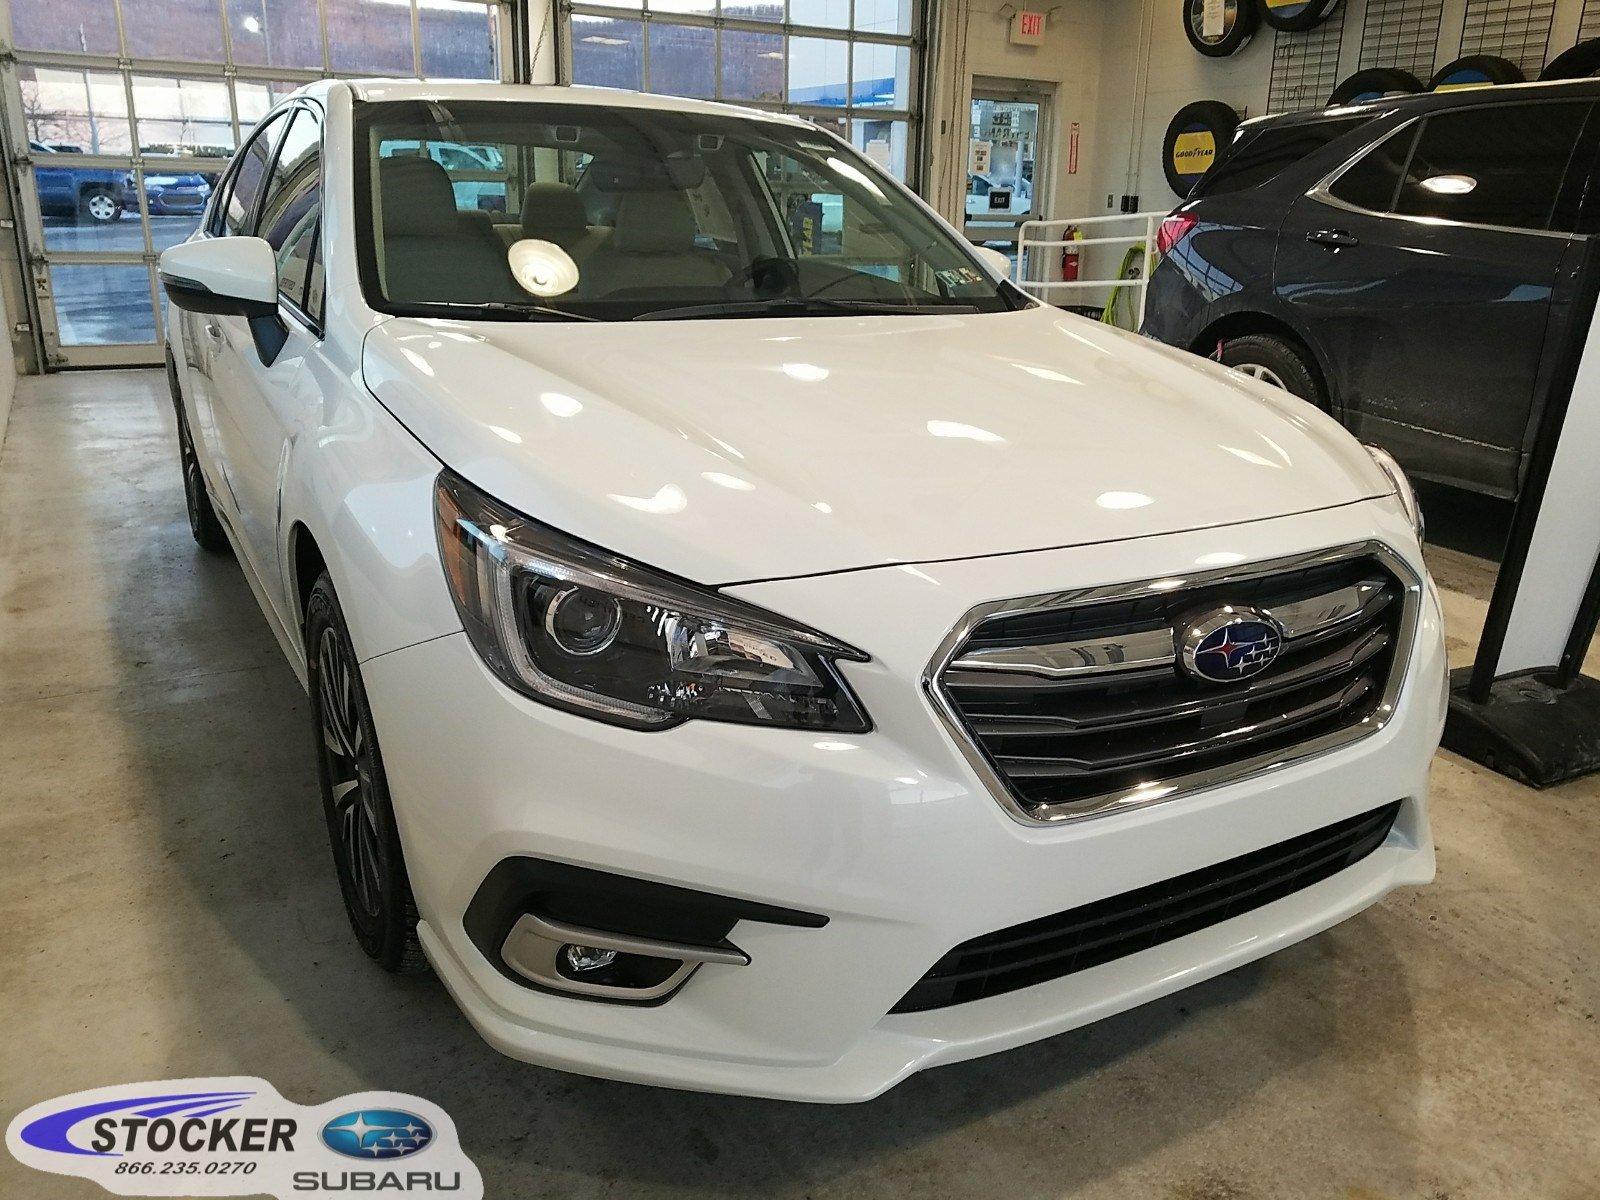 2019 Subaru Legacy 2.5i Premium Sedan for sale in State College, PA